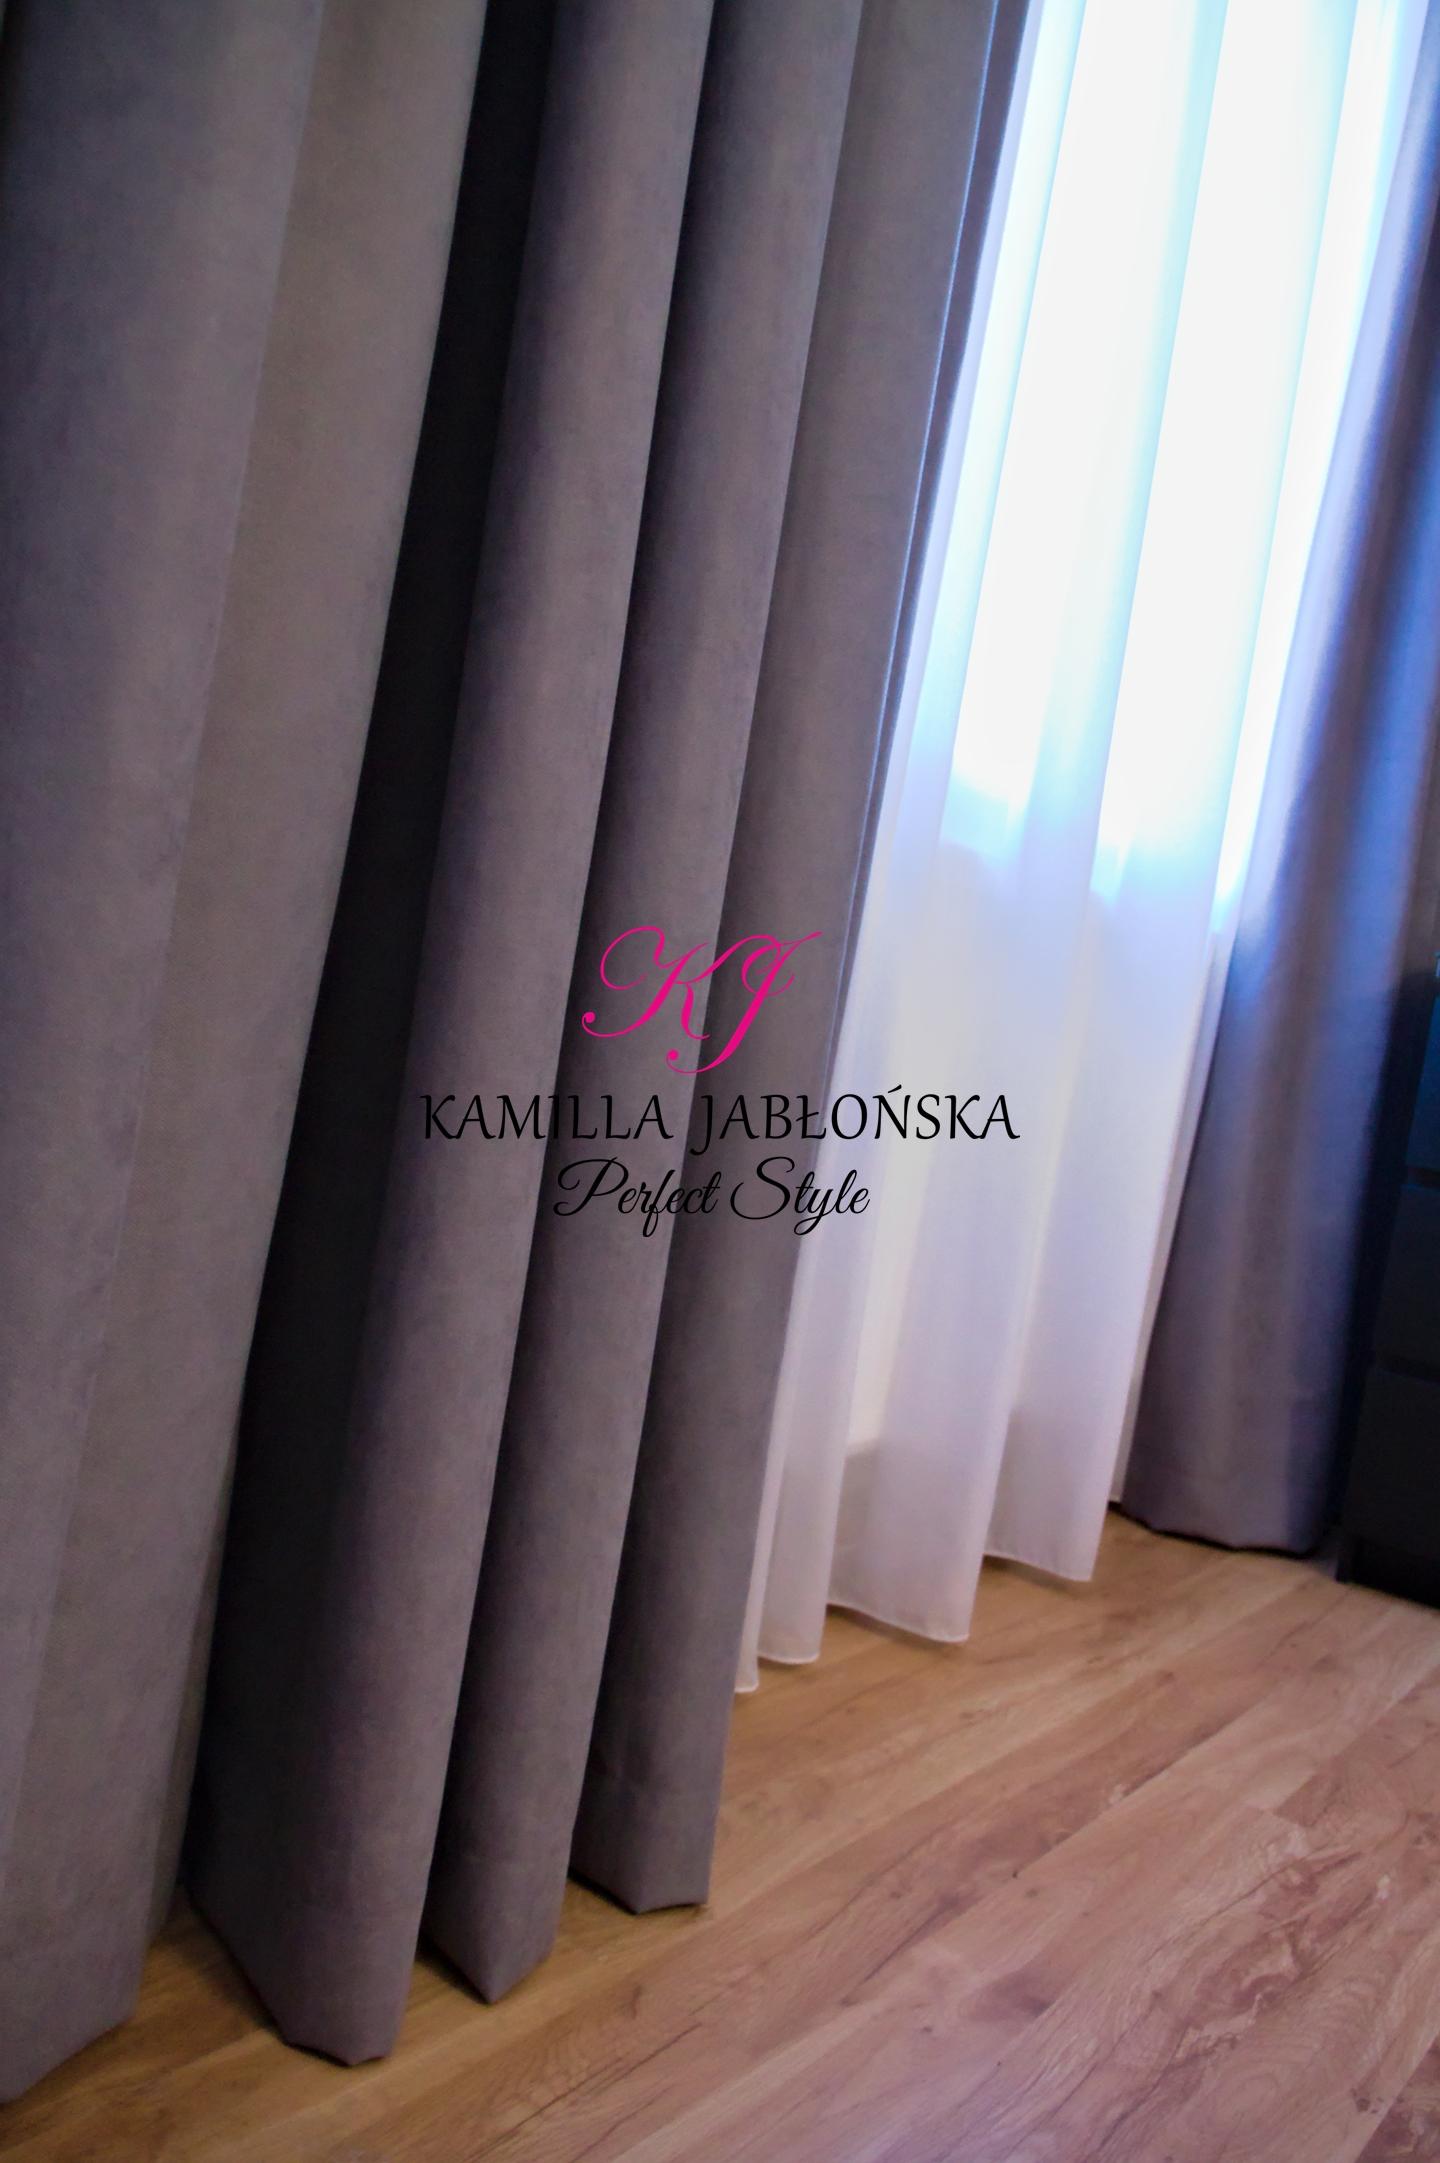 009Perfect Style Kamilla Jabłońska